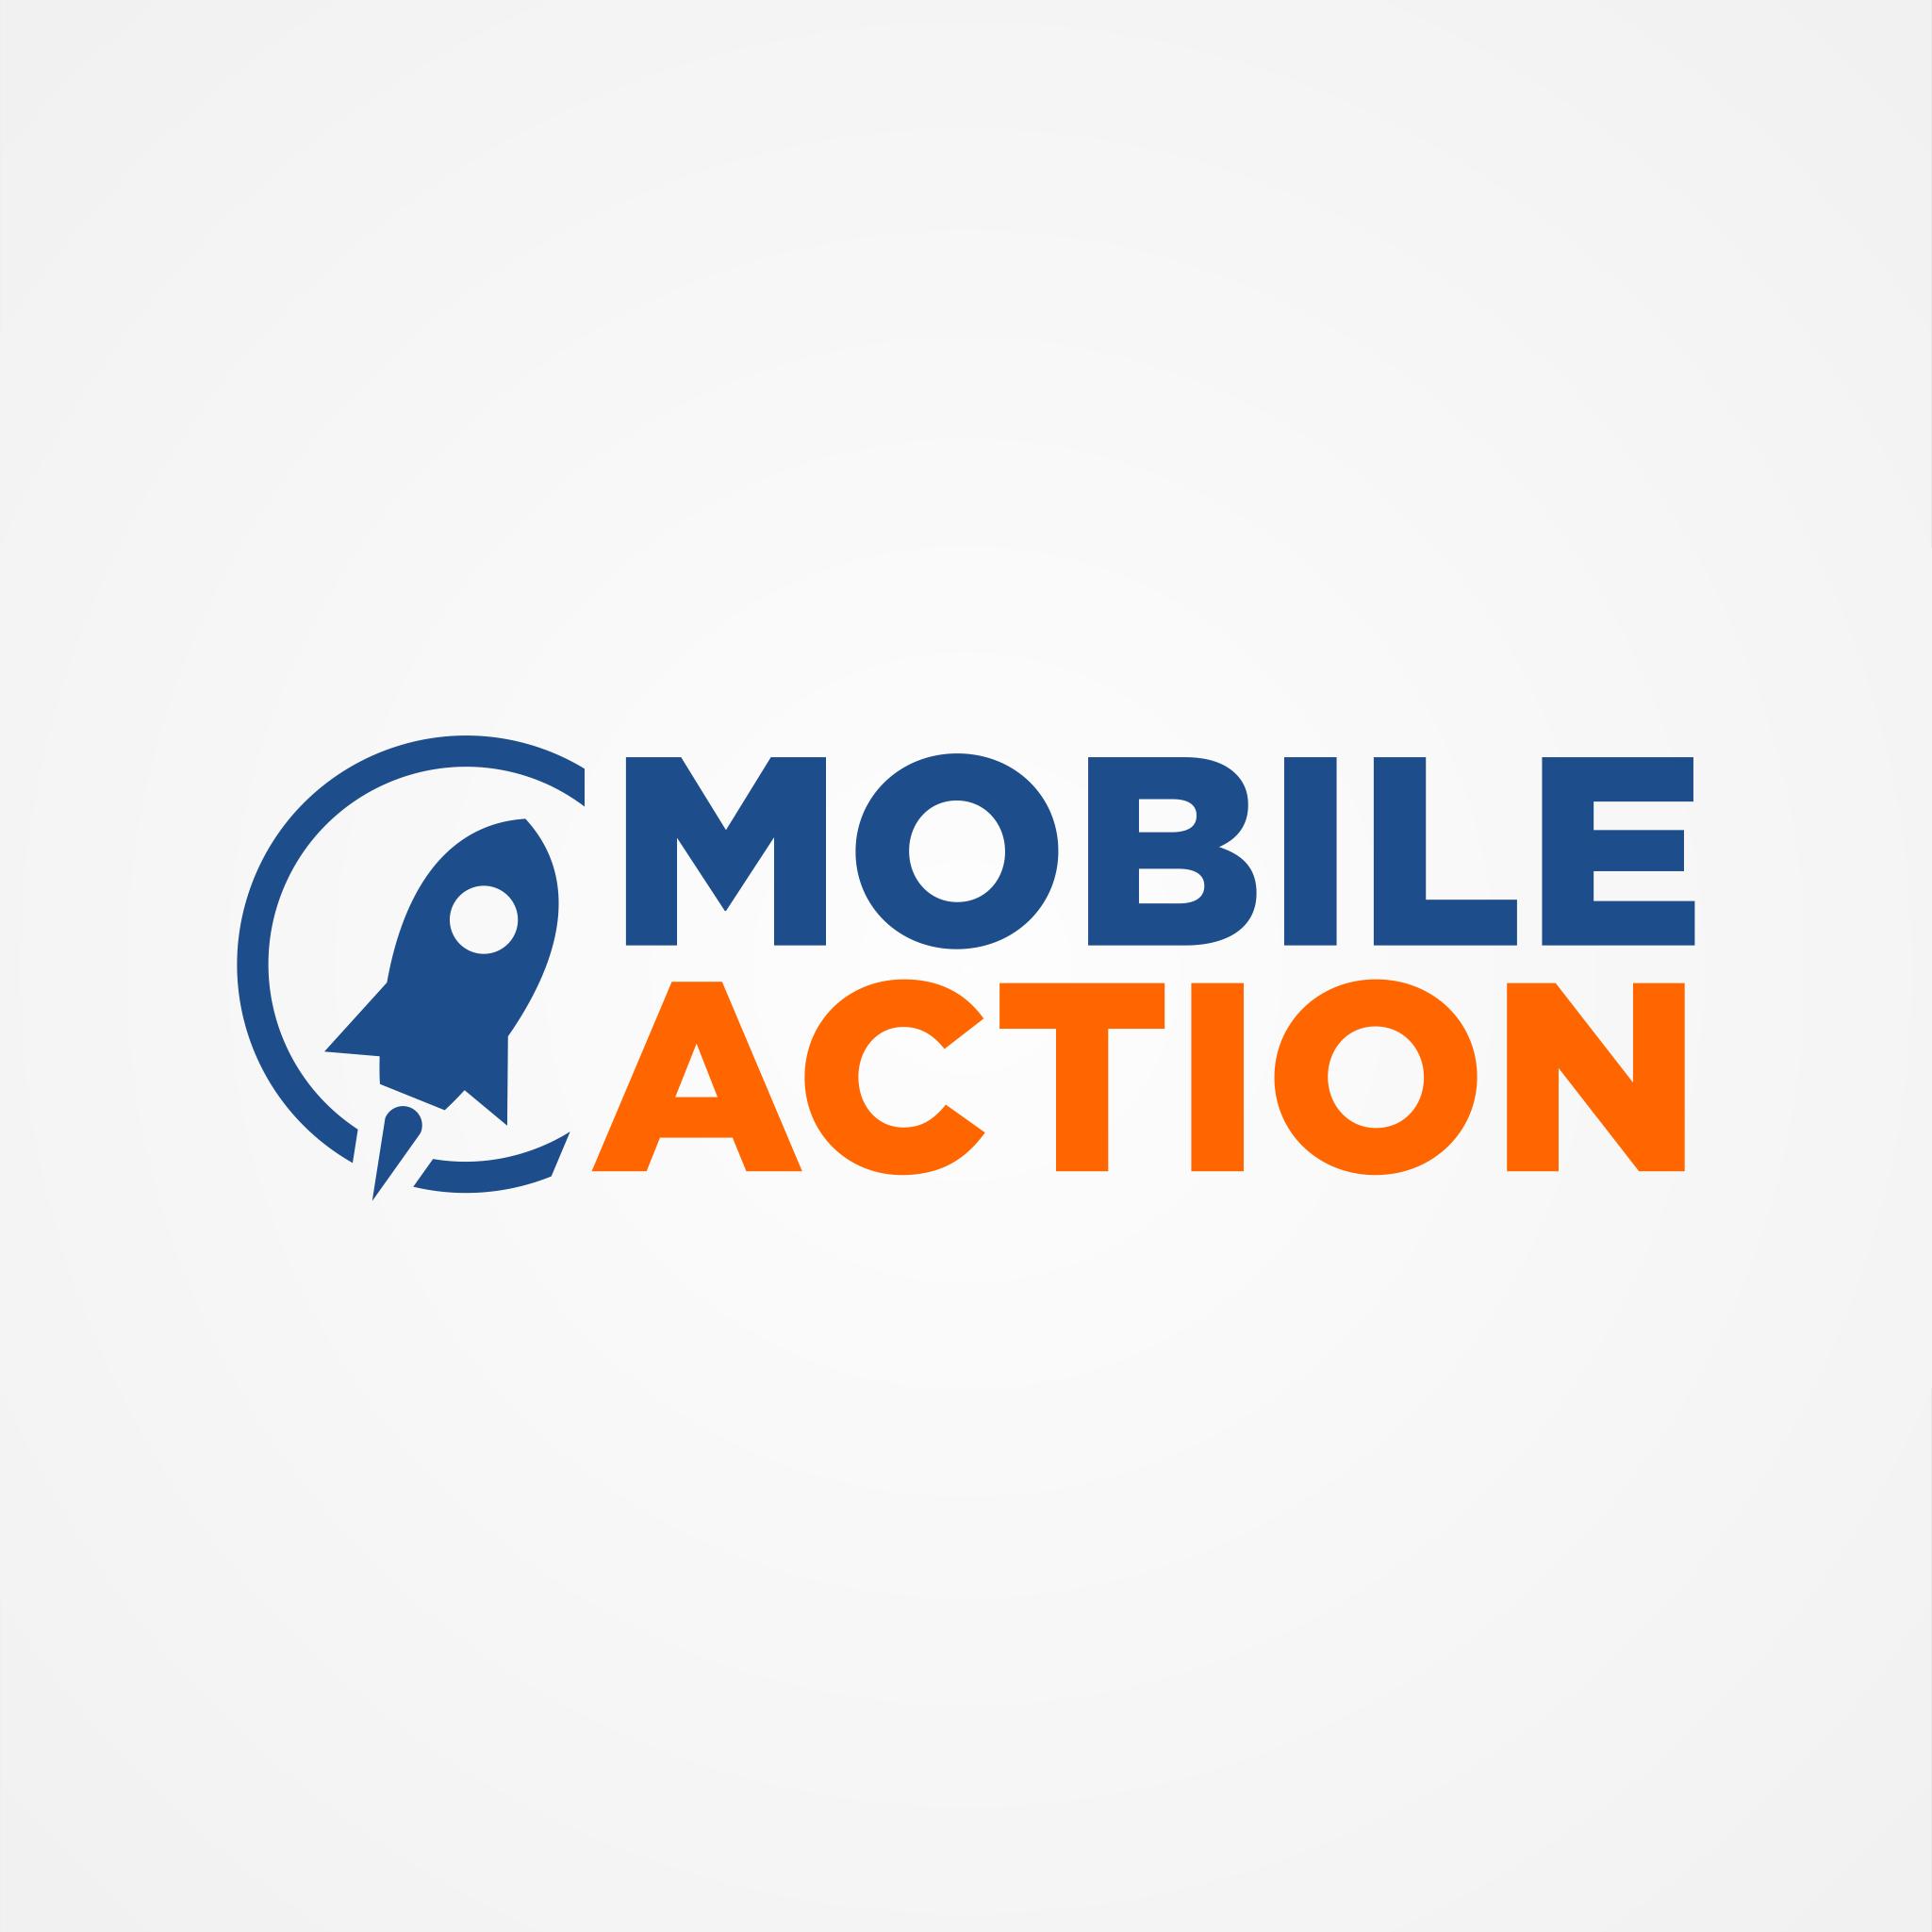 mobile action logo ordia creative